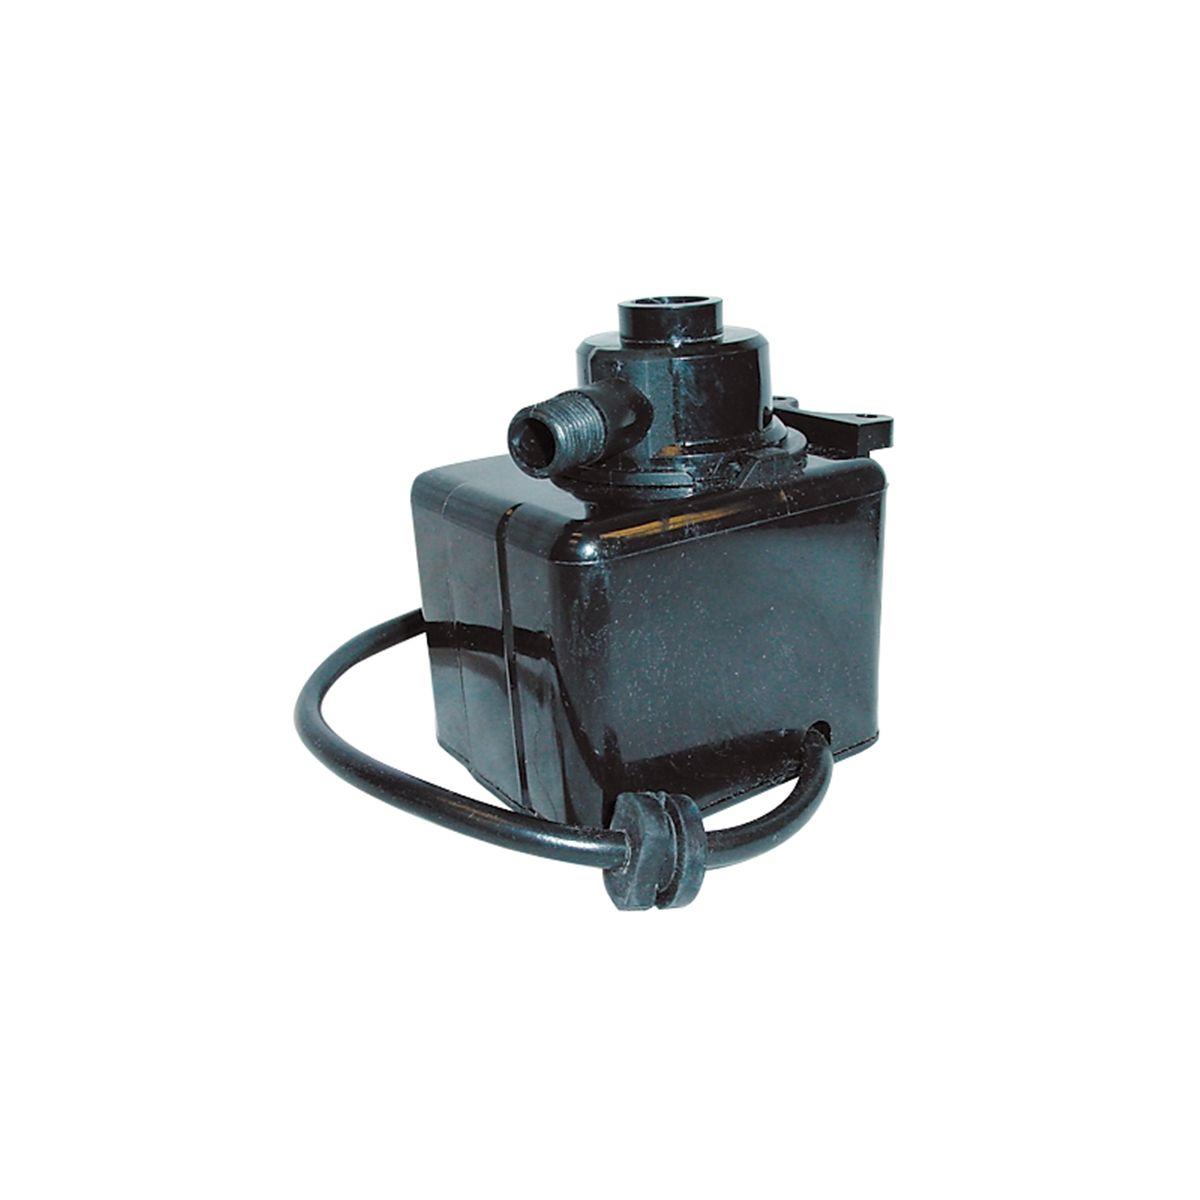 Astro Pneumatic Pwash 07 Parts Washer Pump For Pwash